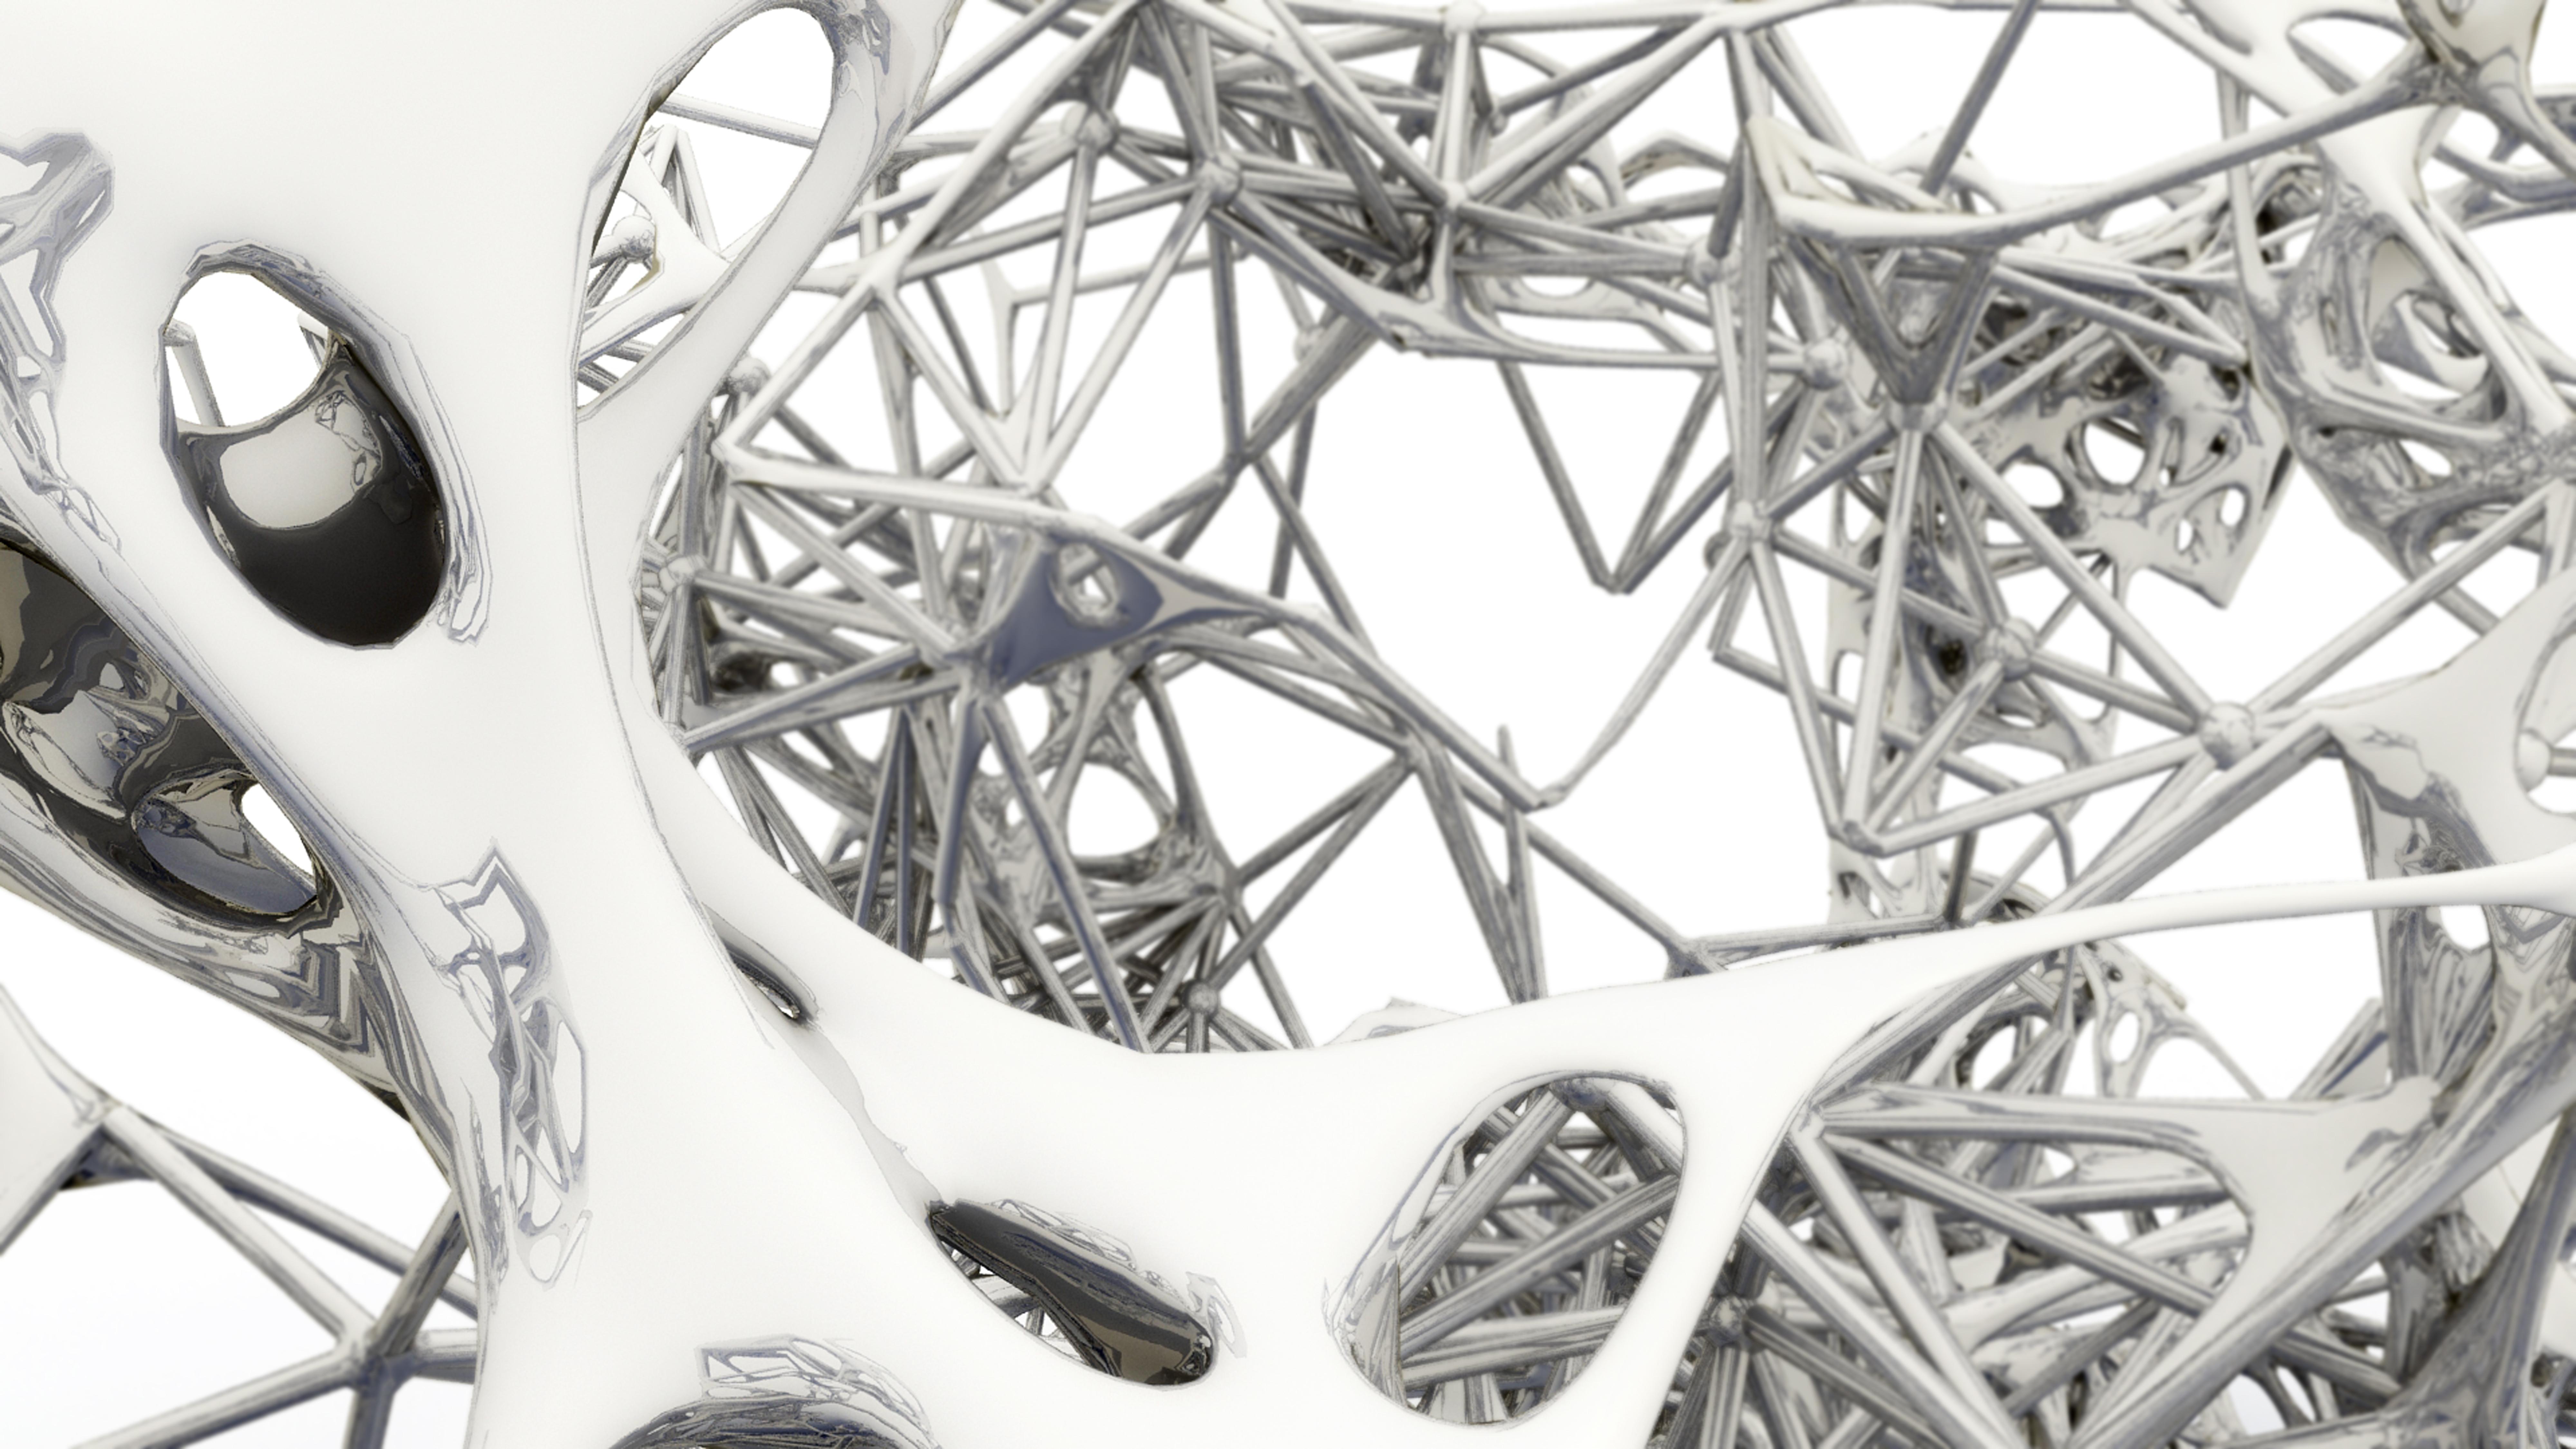 Morphogenetic Structuralism Archimorph - 8000 x 4500 jpeg 7488kB